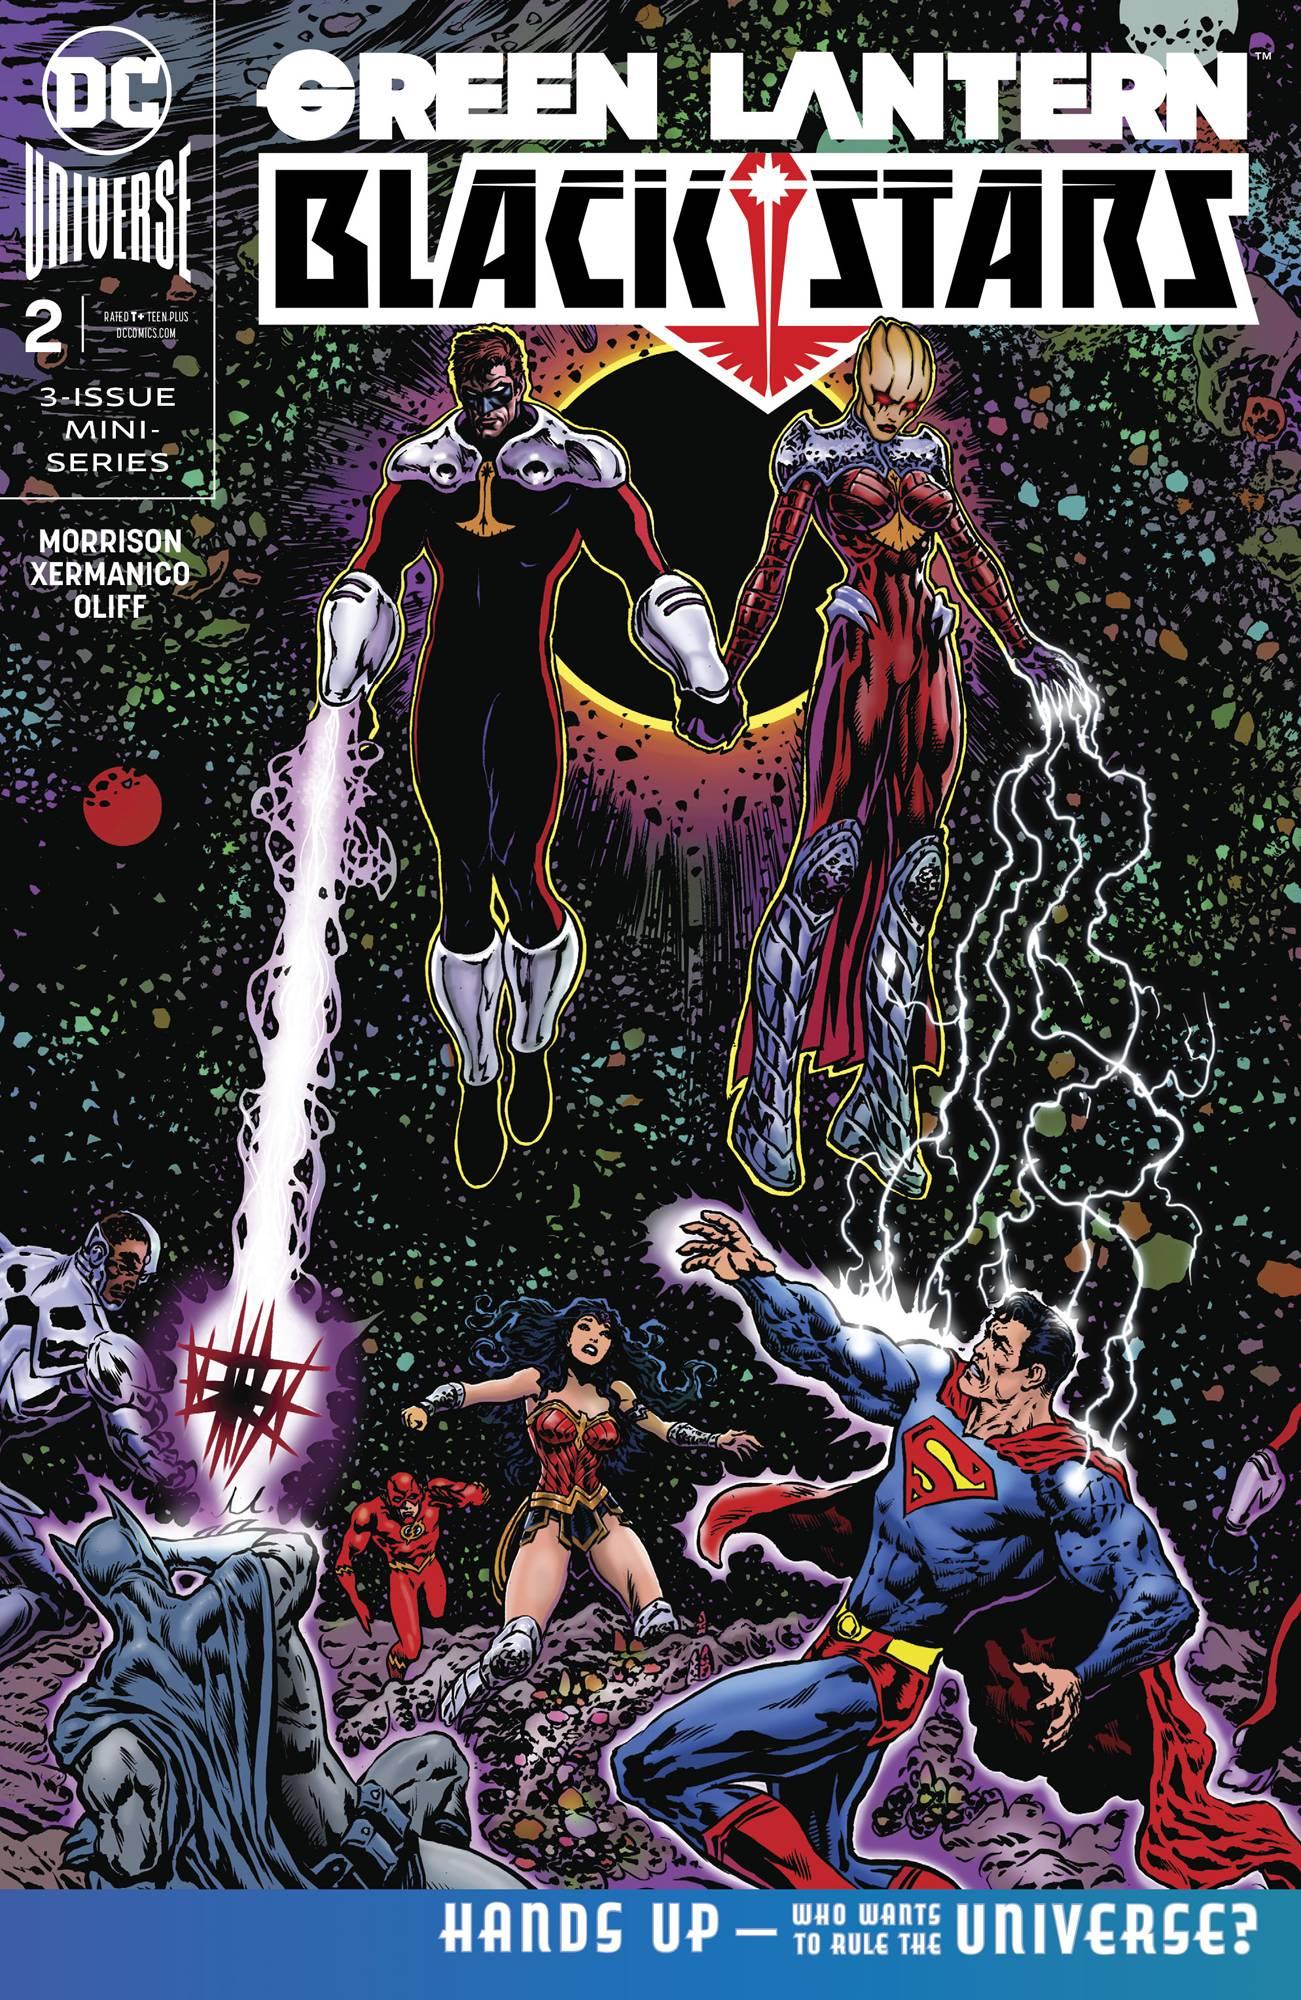 Green Lantern: Blackstars #2 (2019)